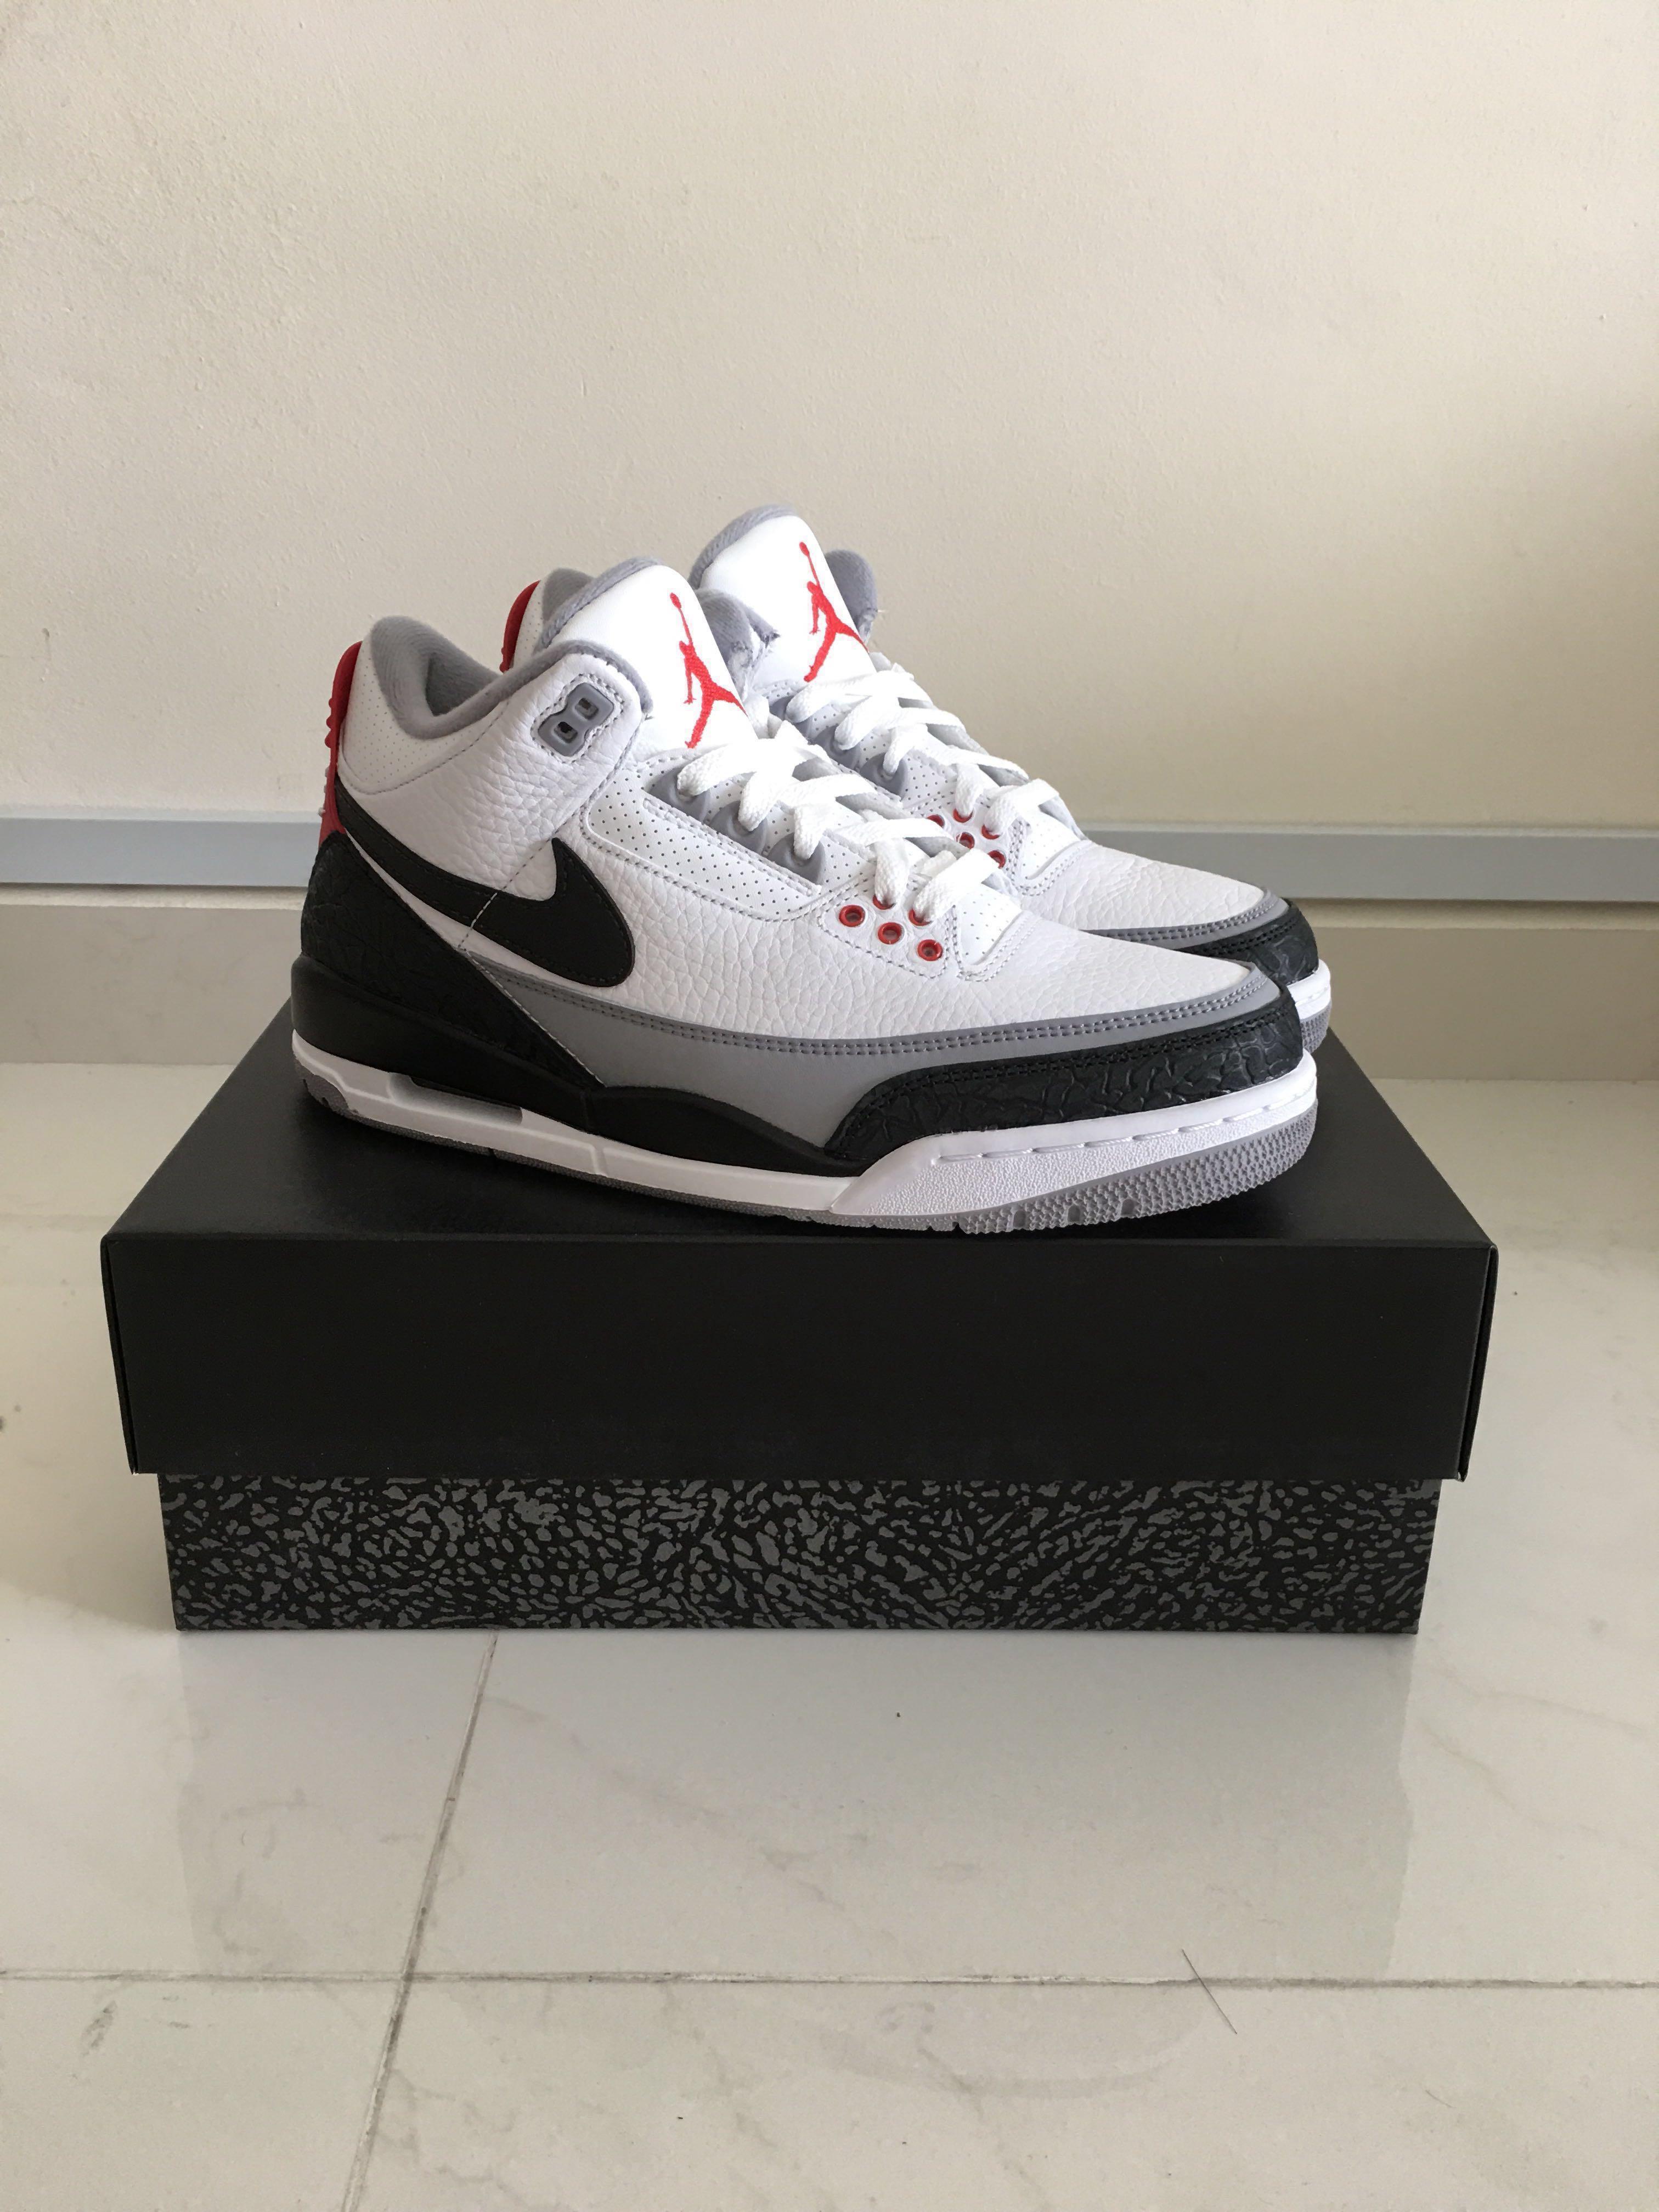 70b5b81256e202 WTS Nike Air Jordan 3 Tinker Hatfield